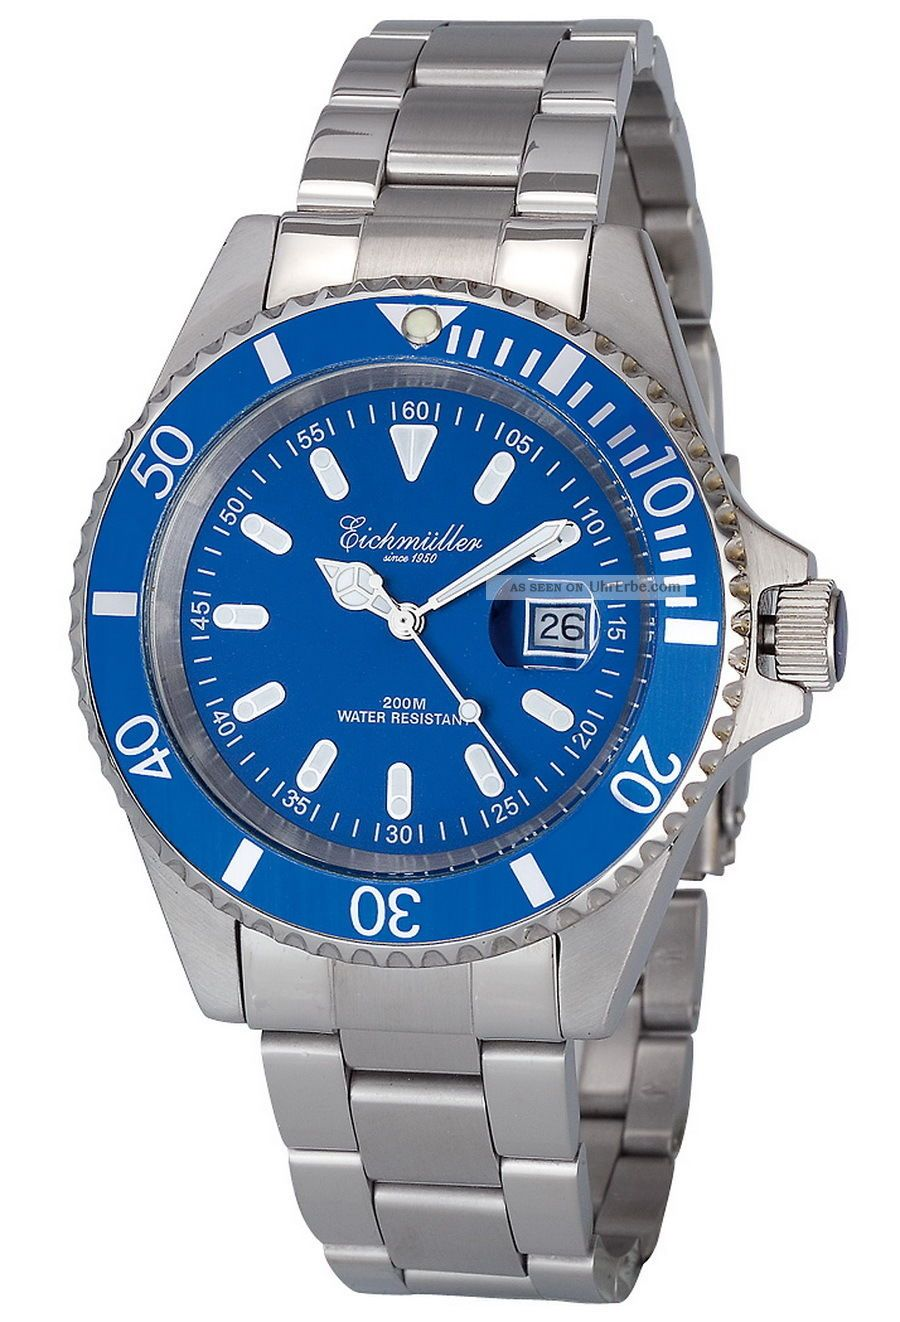 Robuste EichmÜller Uhr Herrenuhr Edelstahl Taucheruhr 20 Atm /200m,  Ovp,  Blau Armbanduhren Bild